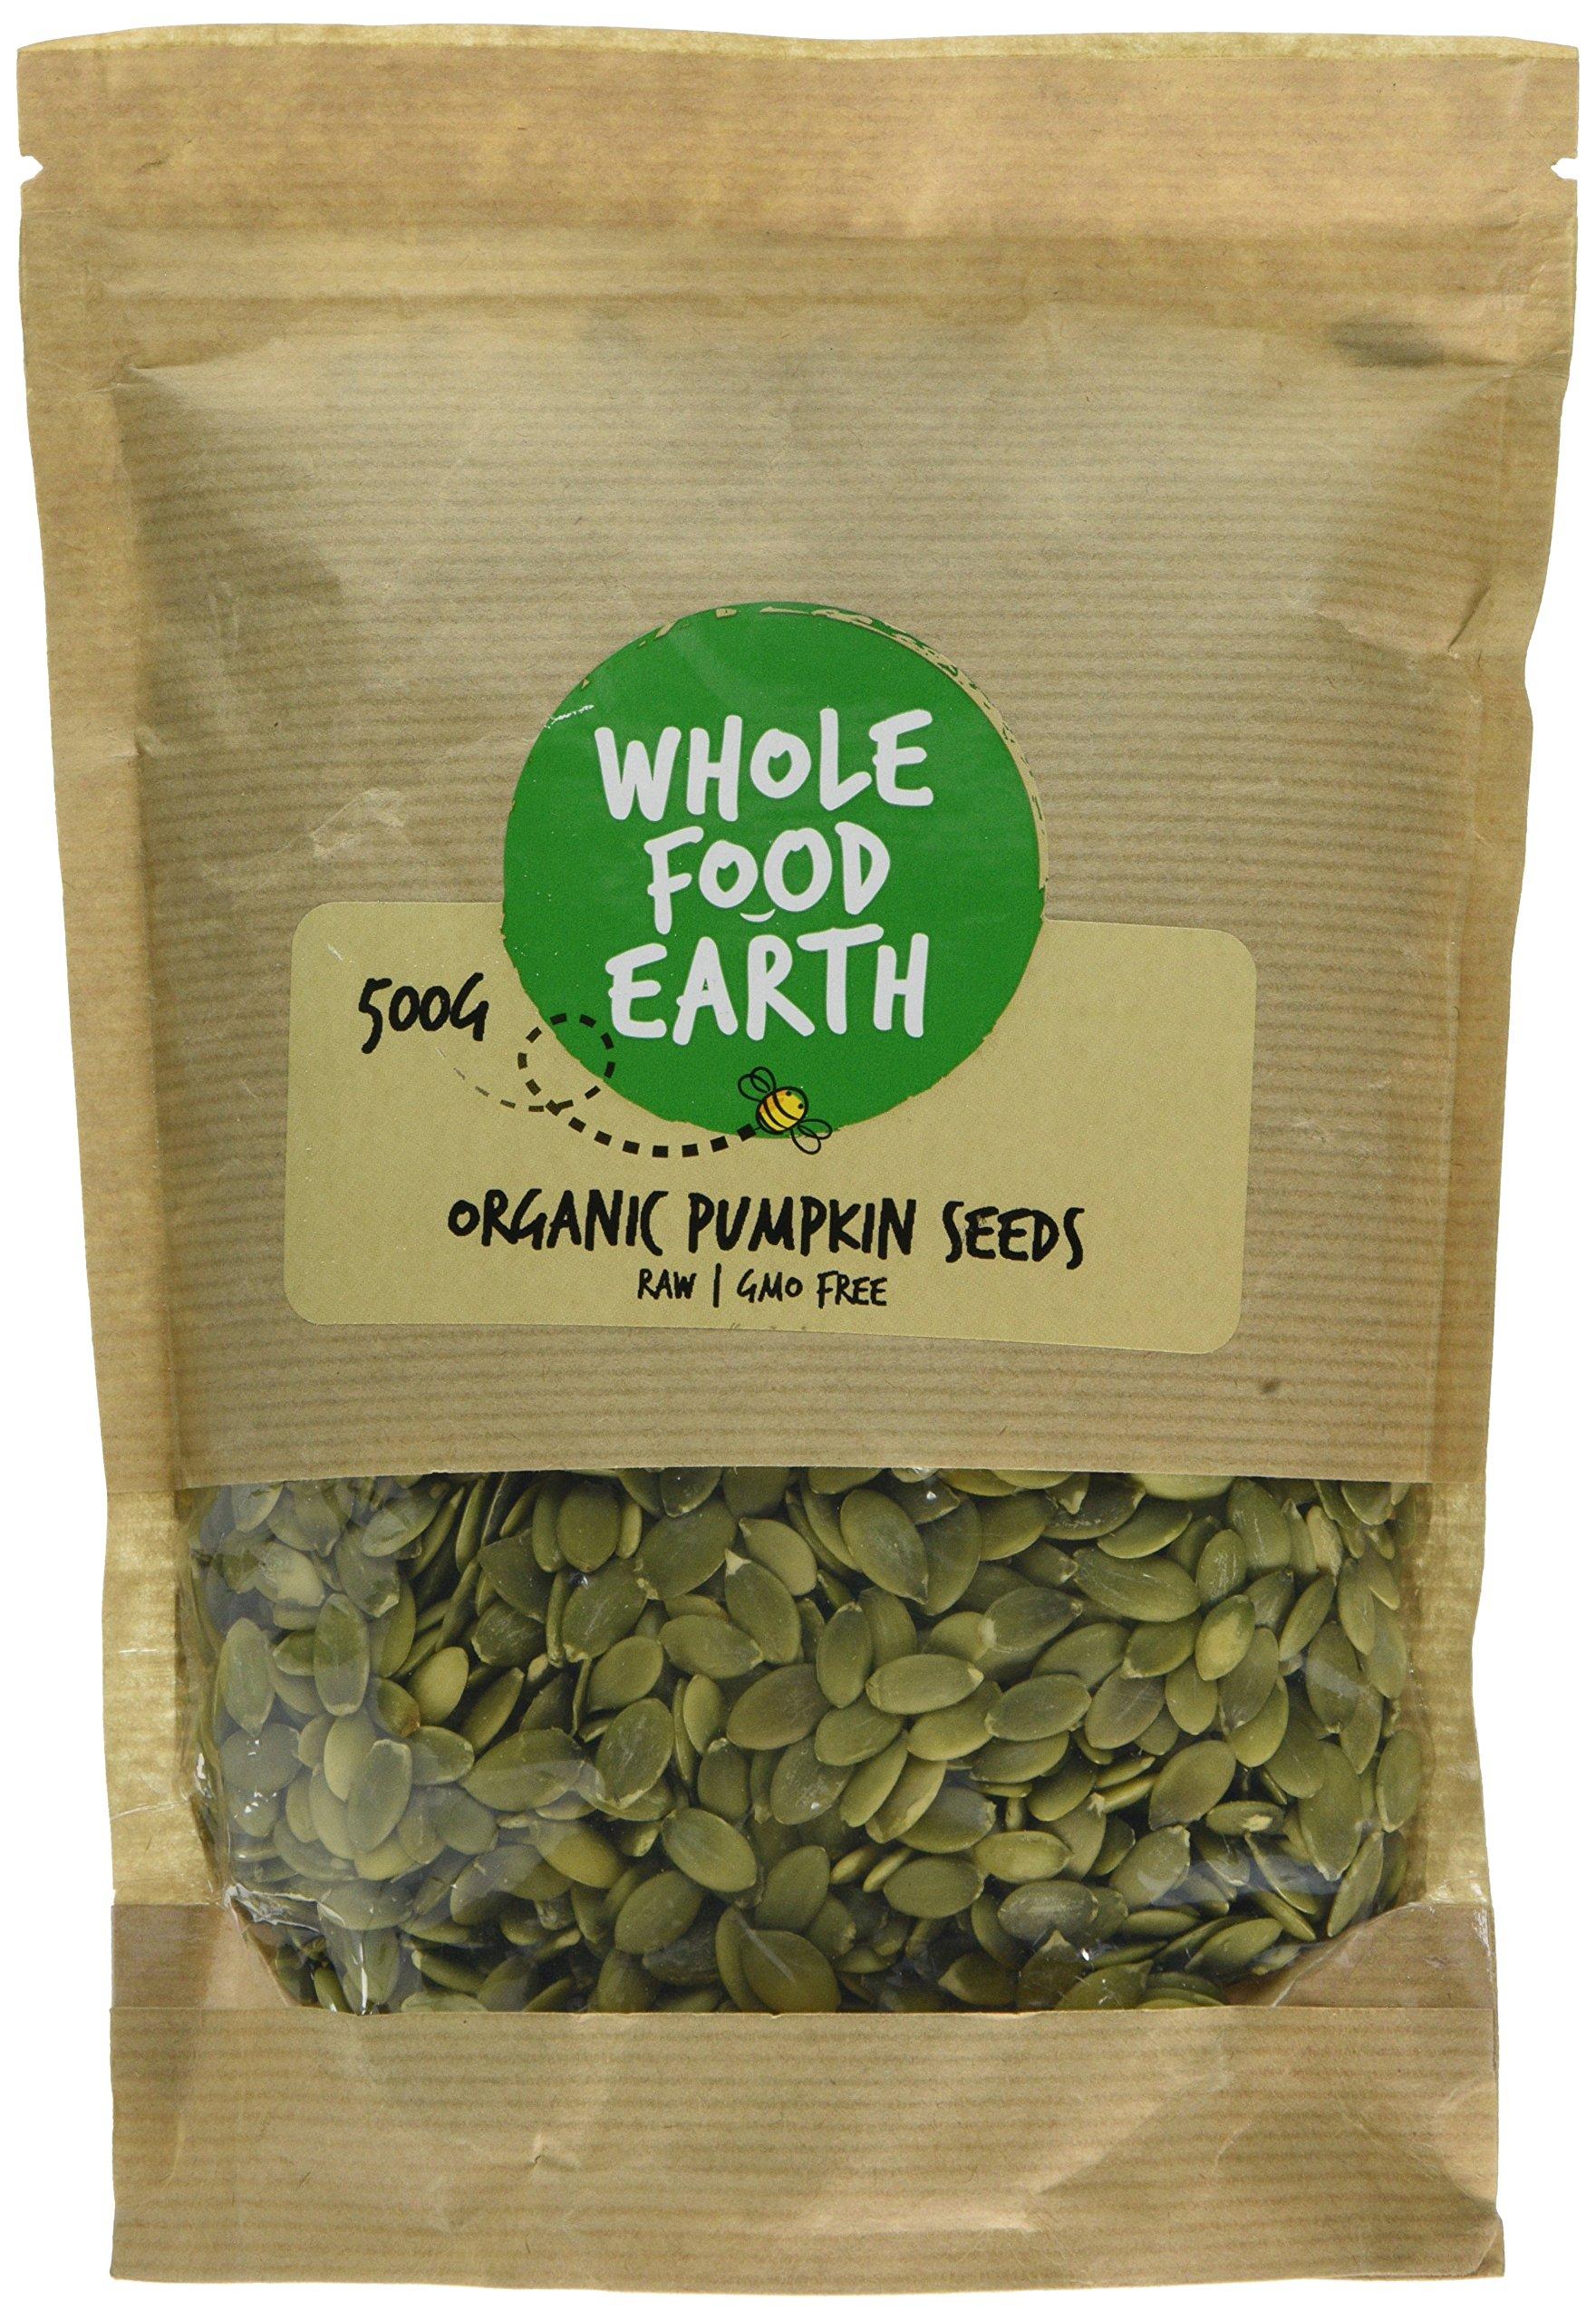 Wholefood Earth Organic Pumpkin Seeds, 500 g